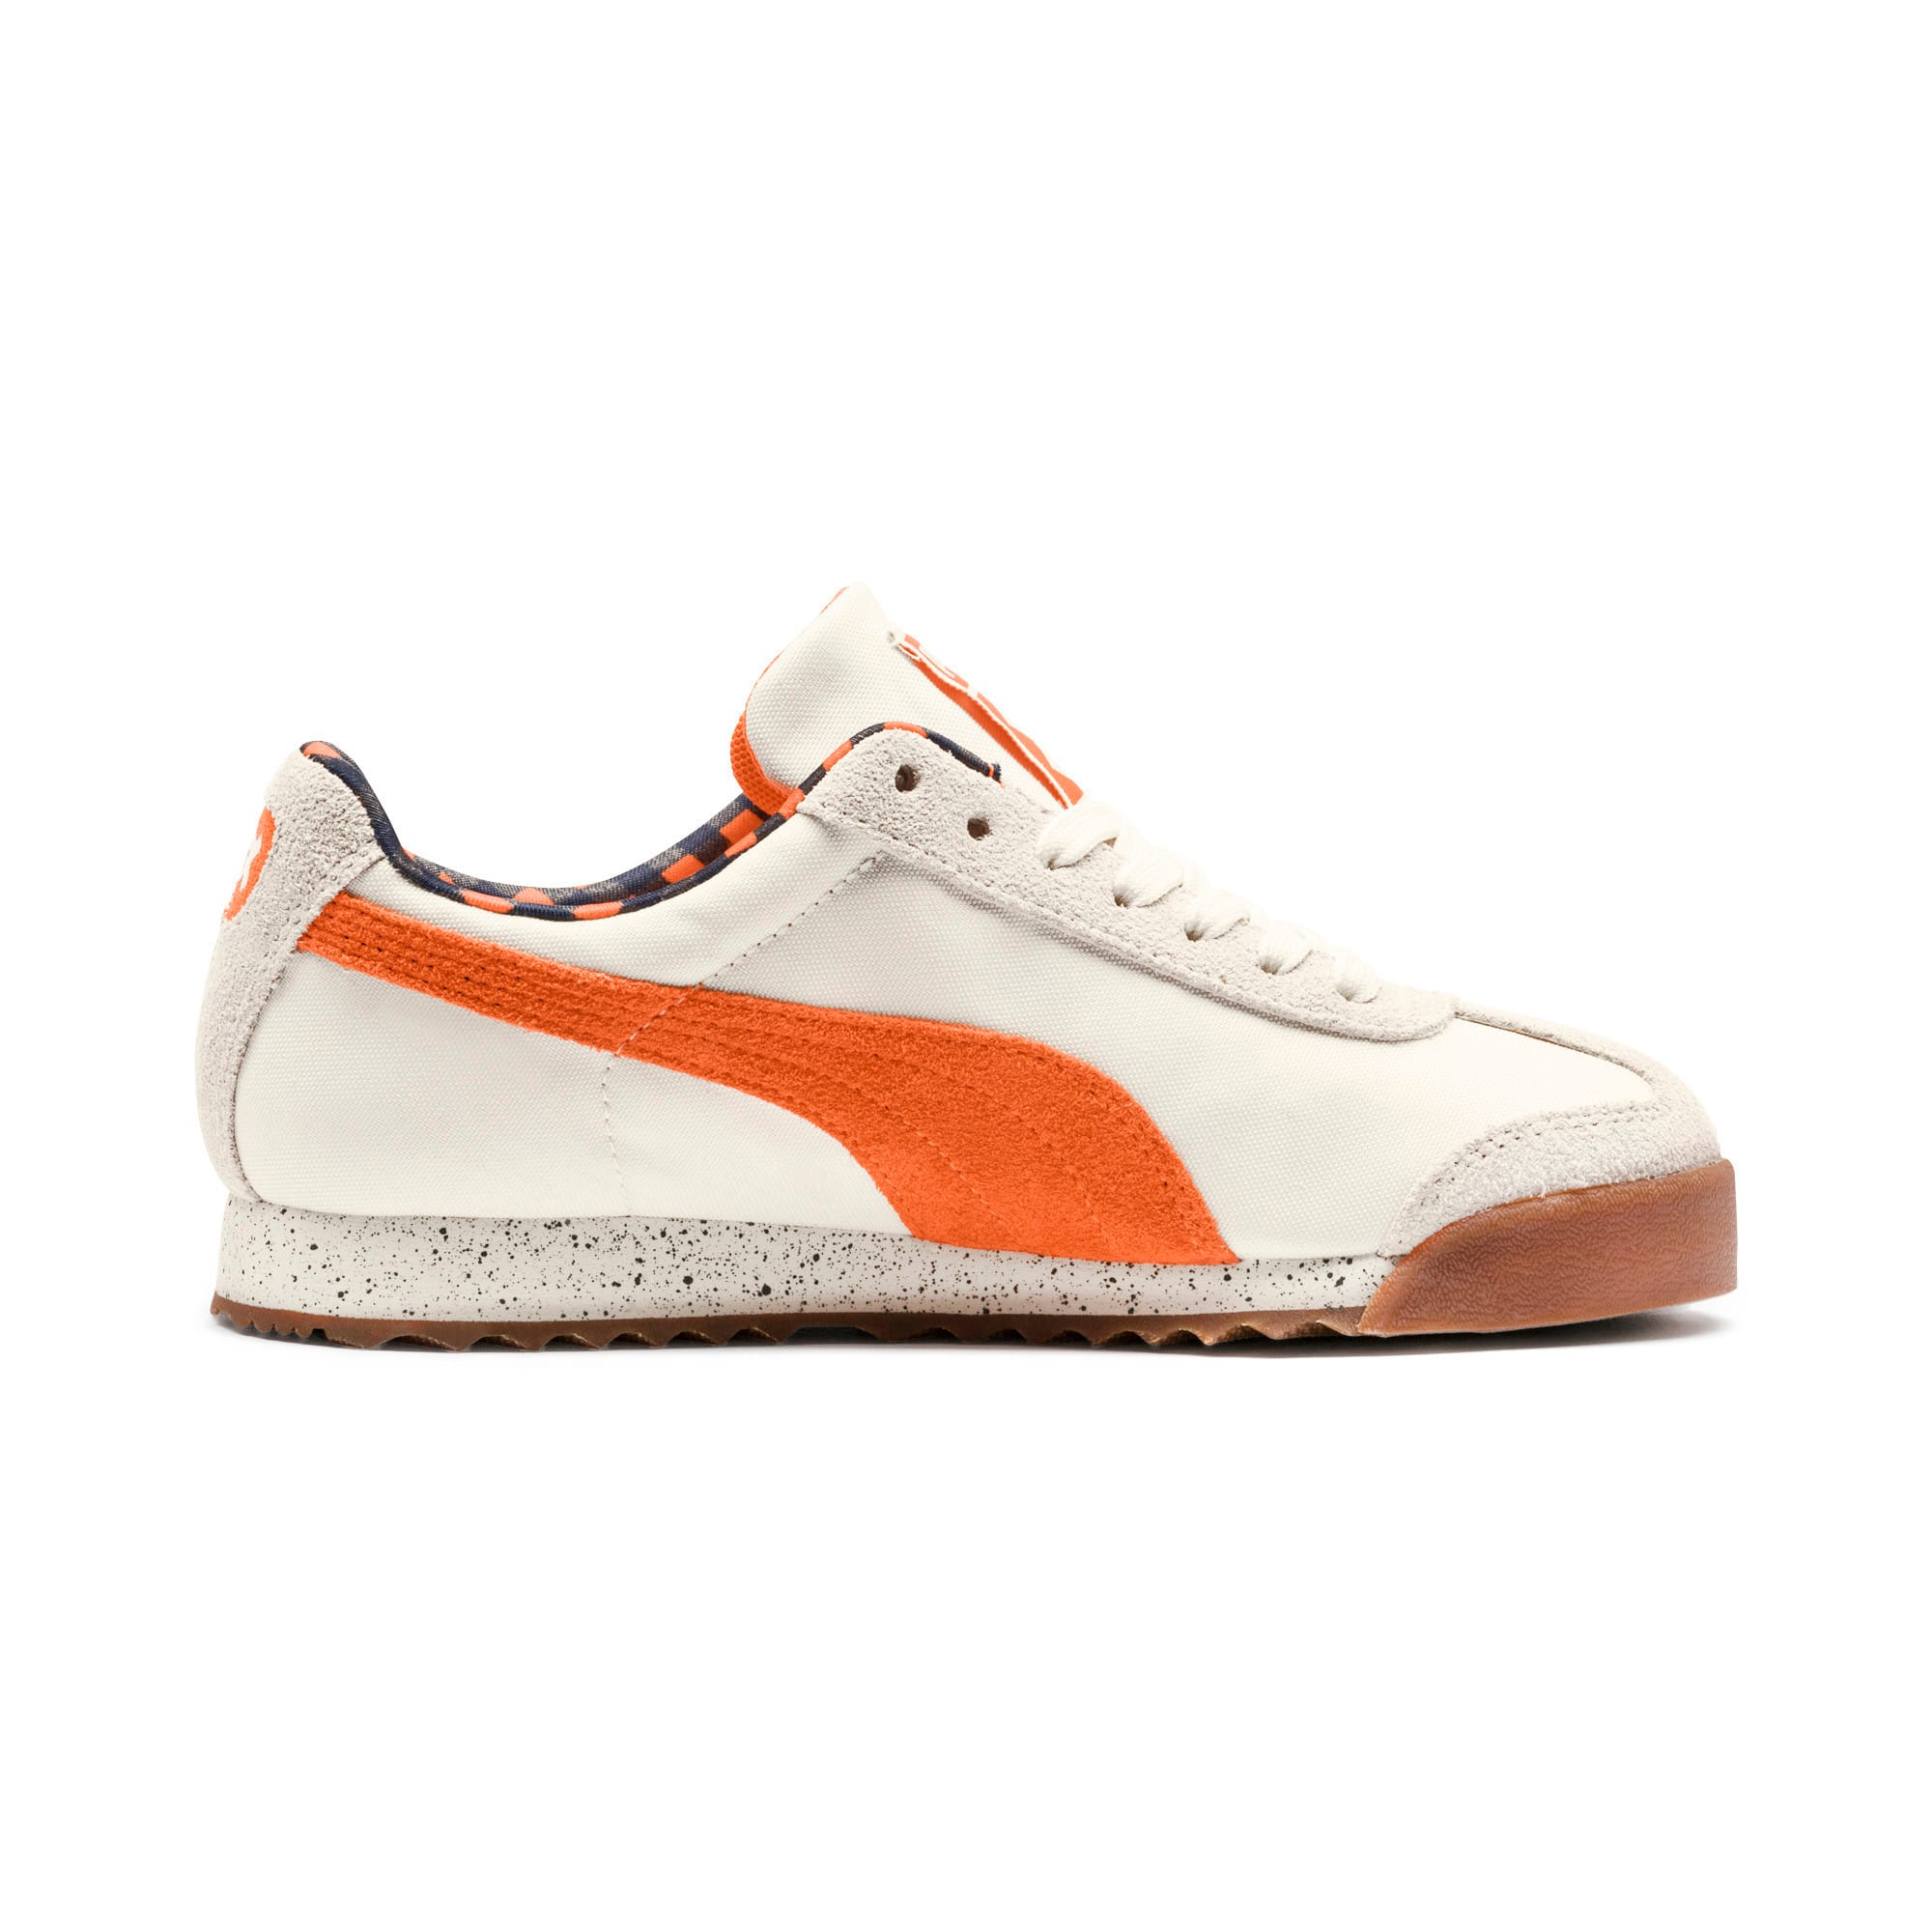 Thumbnail 5 of PUMA X TINYCOTTONS Roma Sneakers JR, White Asparagus-Orange-Blue, medium